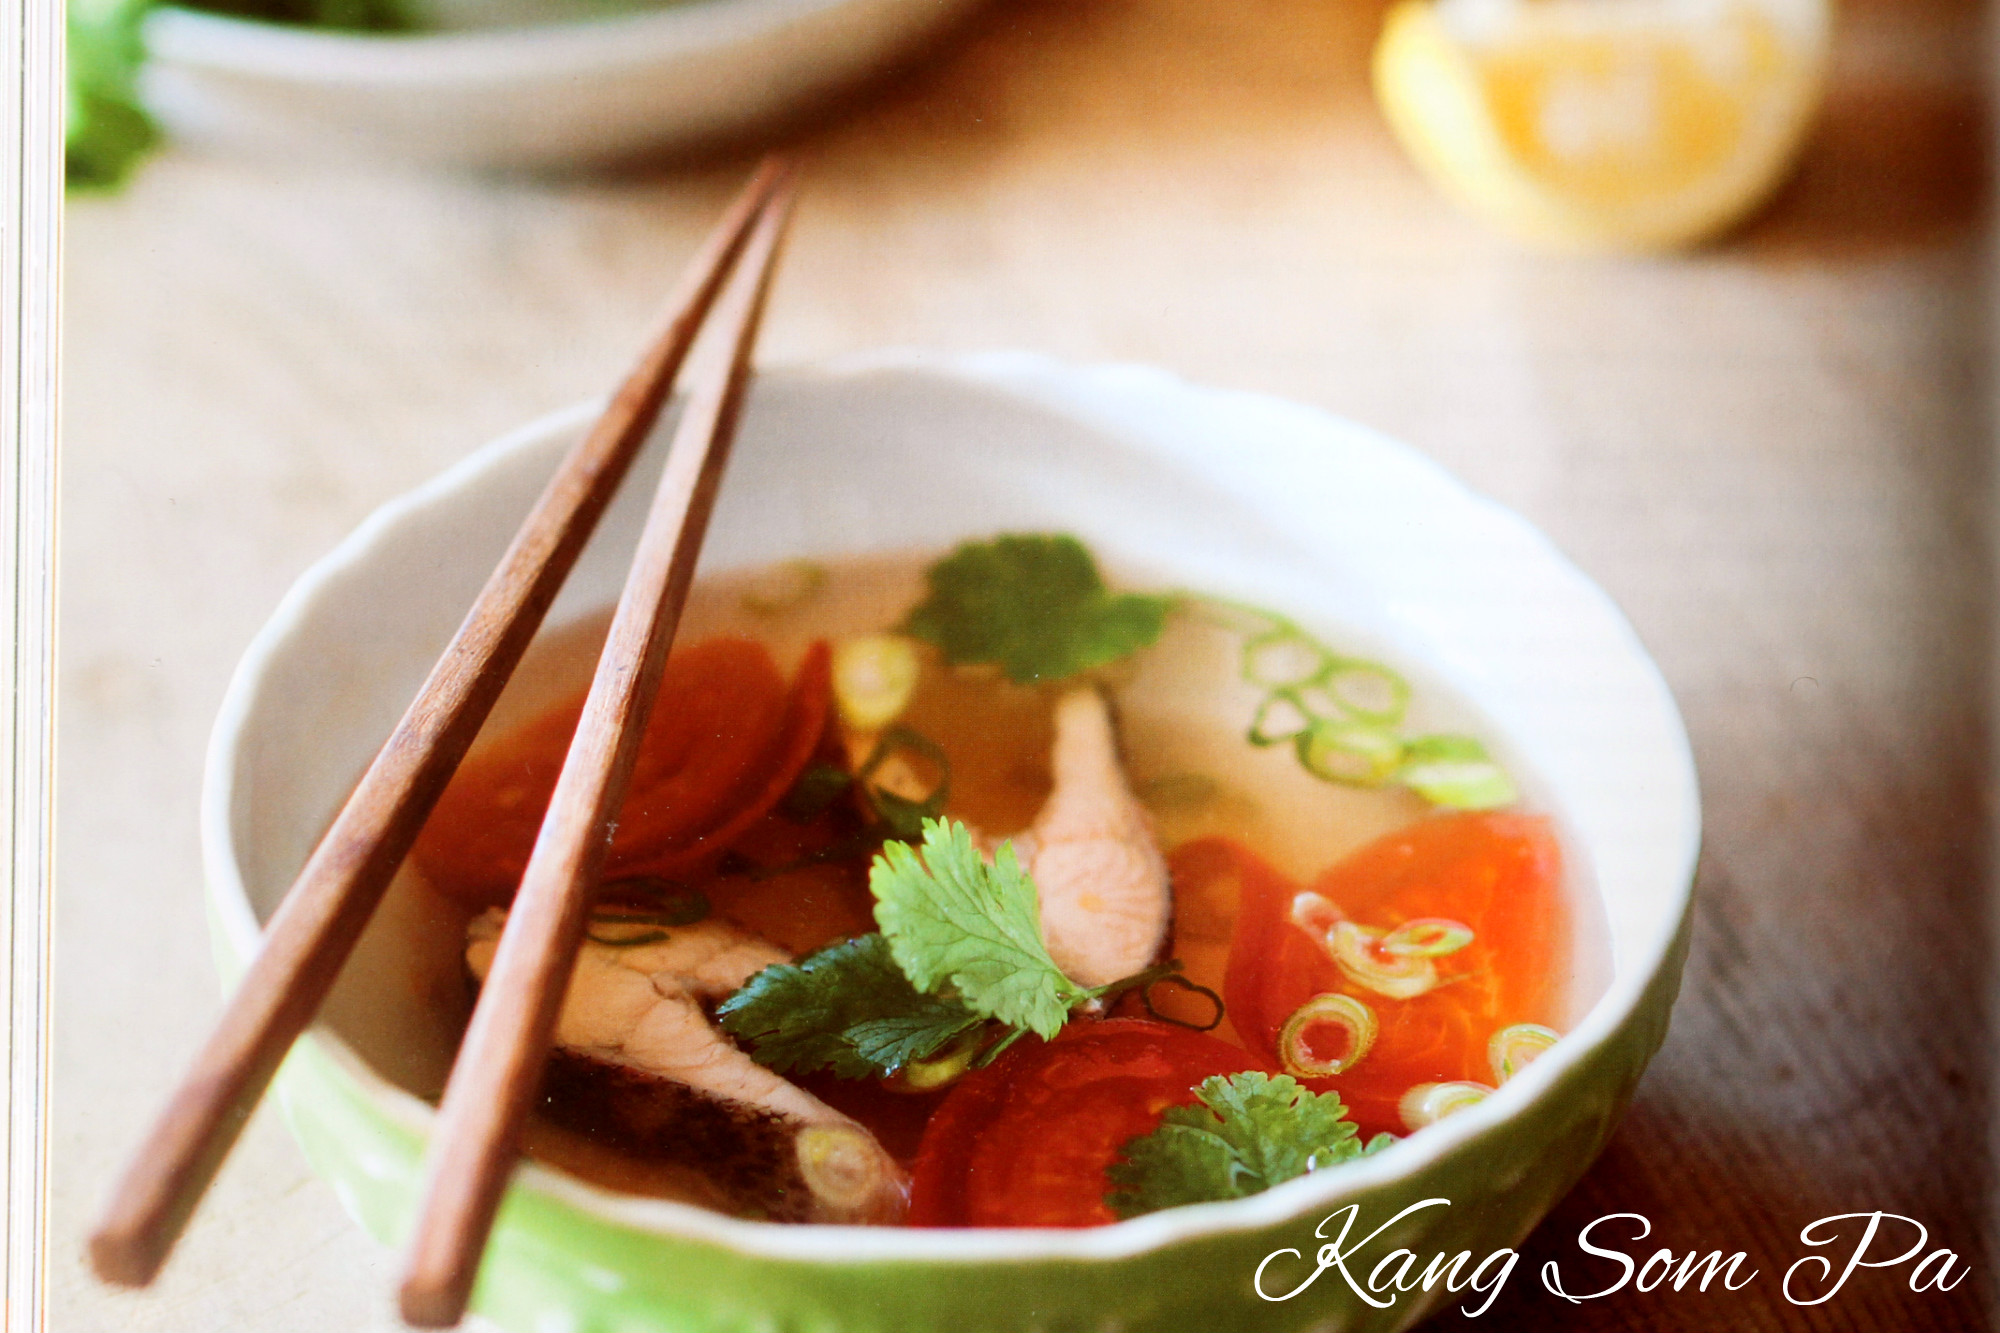 Kang Som Pa| Laotian fish soup